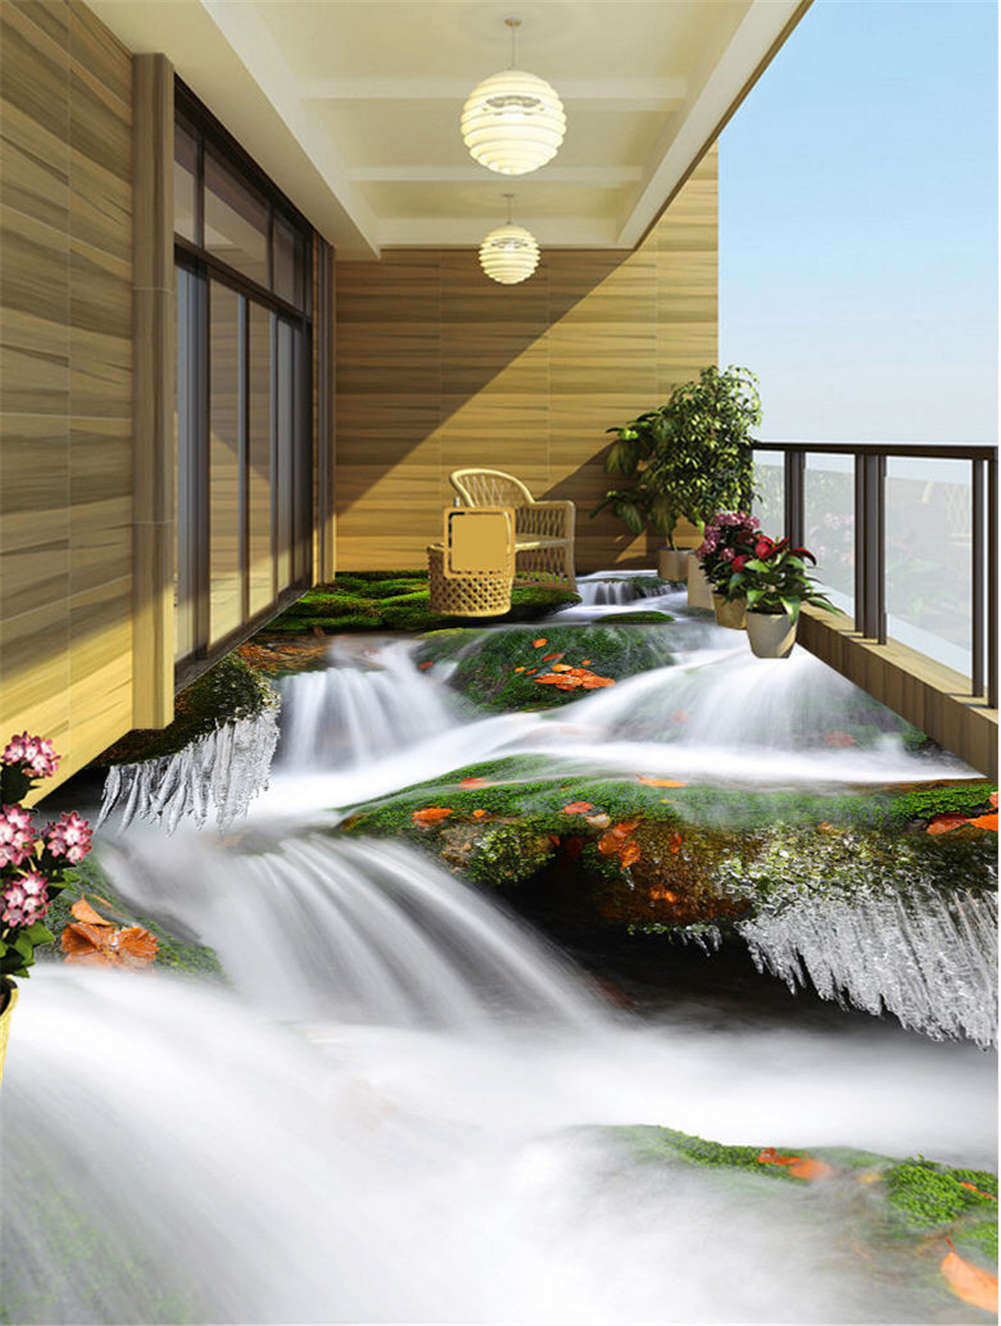 Rushing Waterfalls 3D Floor Mural Photo Flooring Wallpaper Home Print Decoration